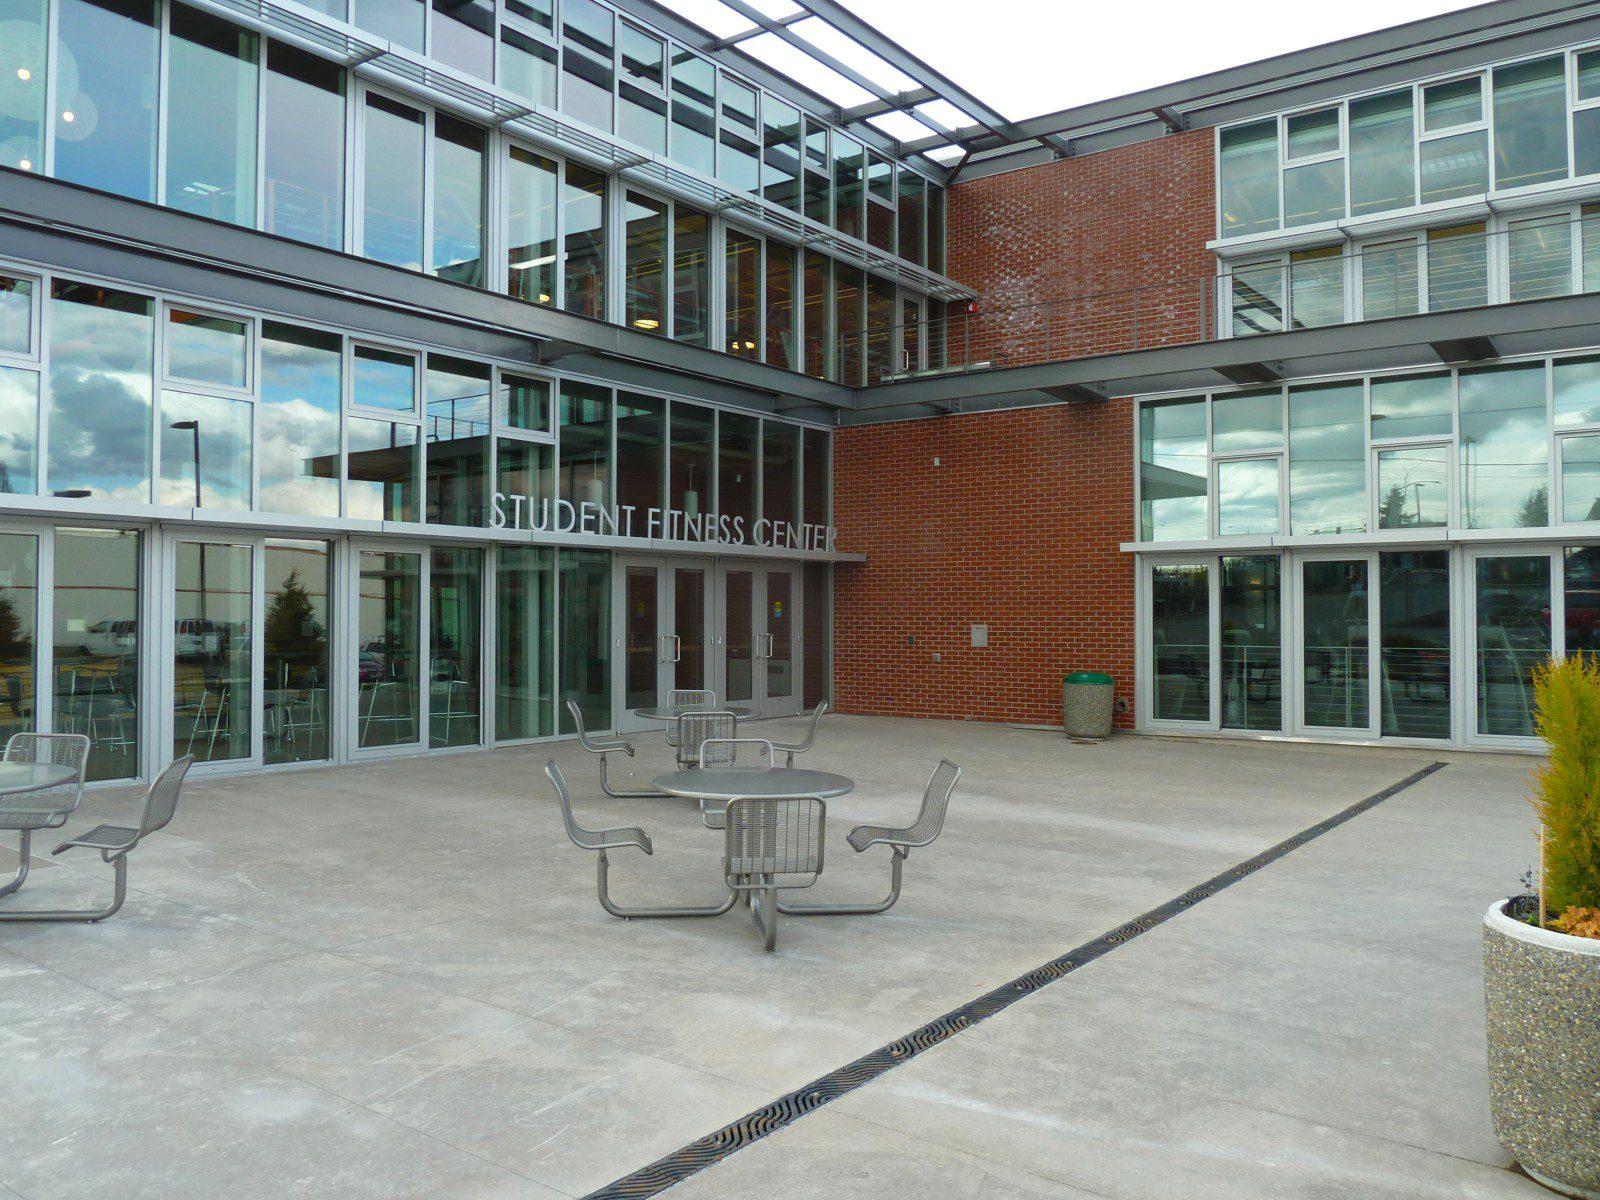 Everett Community College Walt Price Student Fitness Center_main